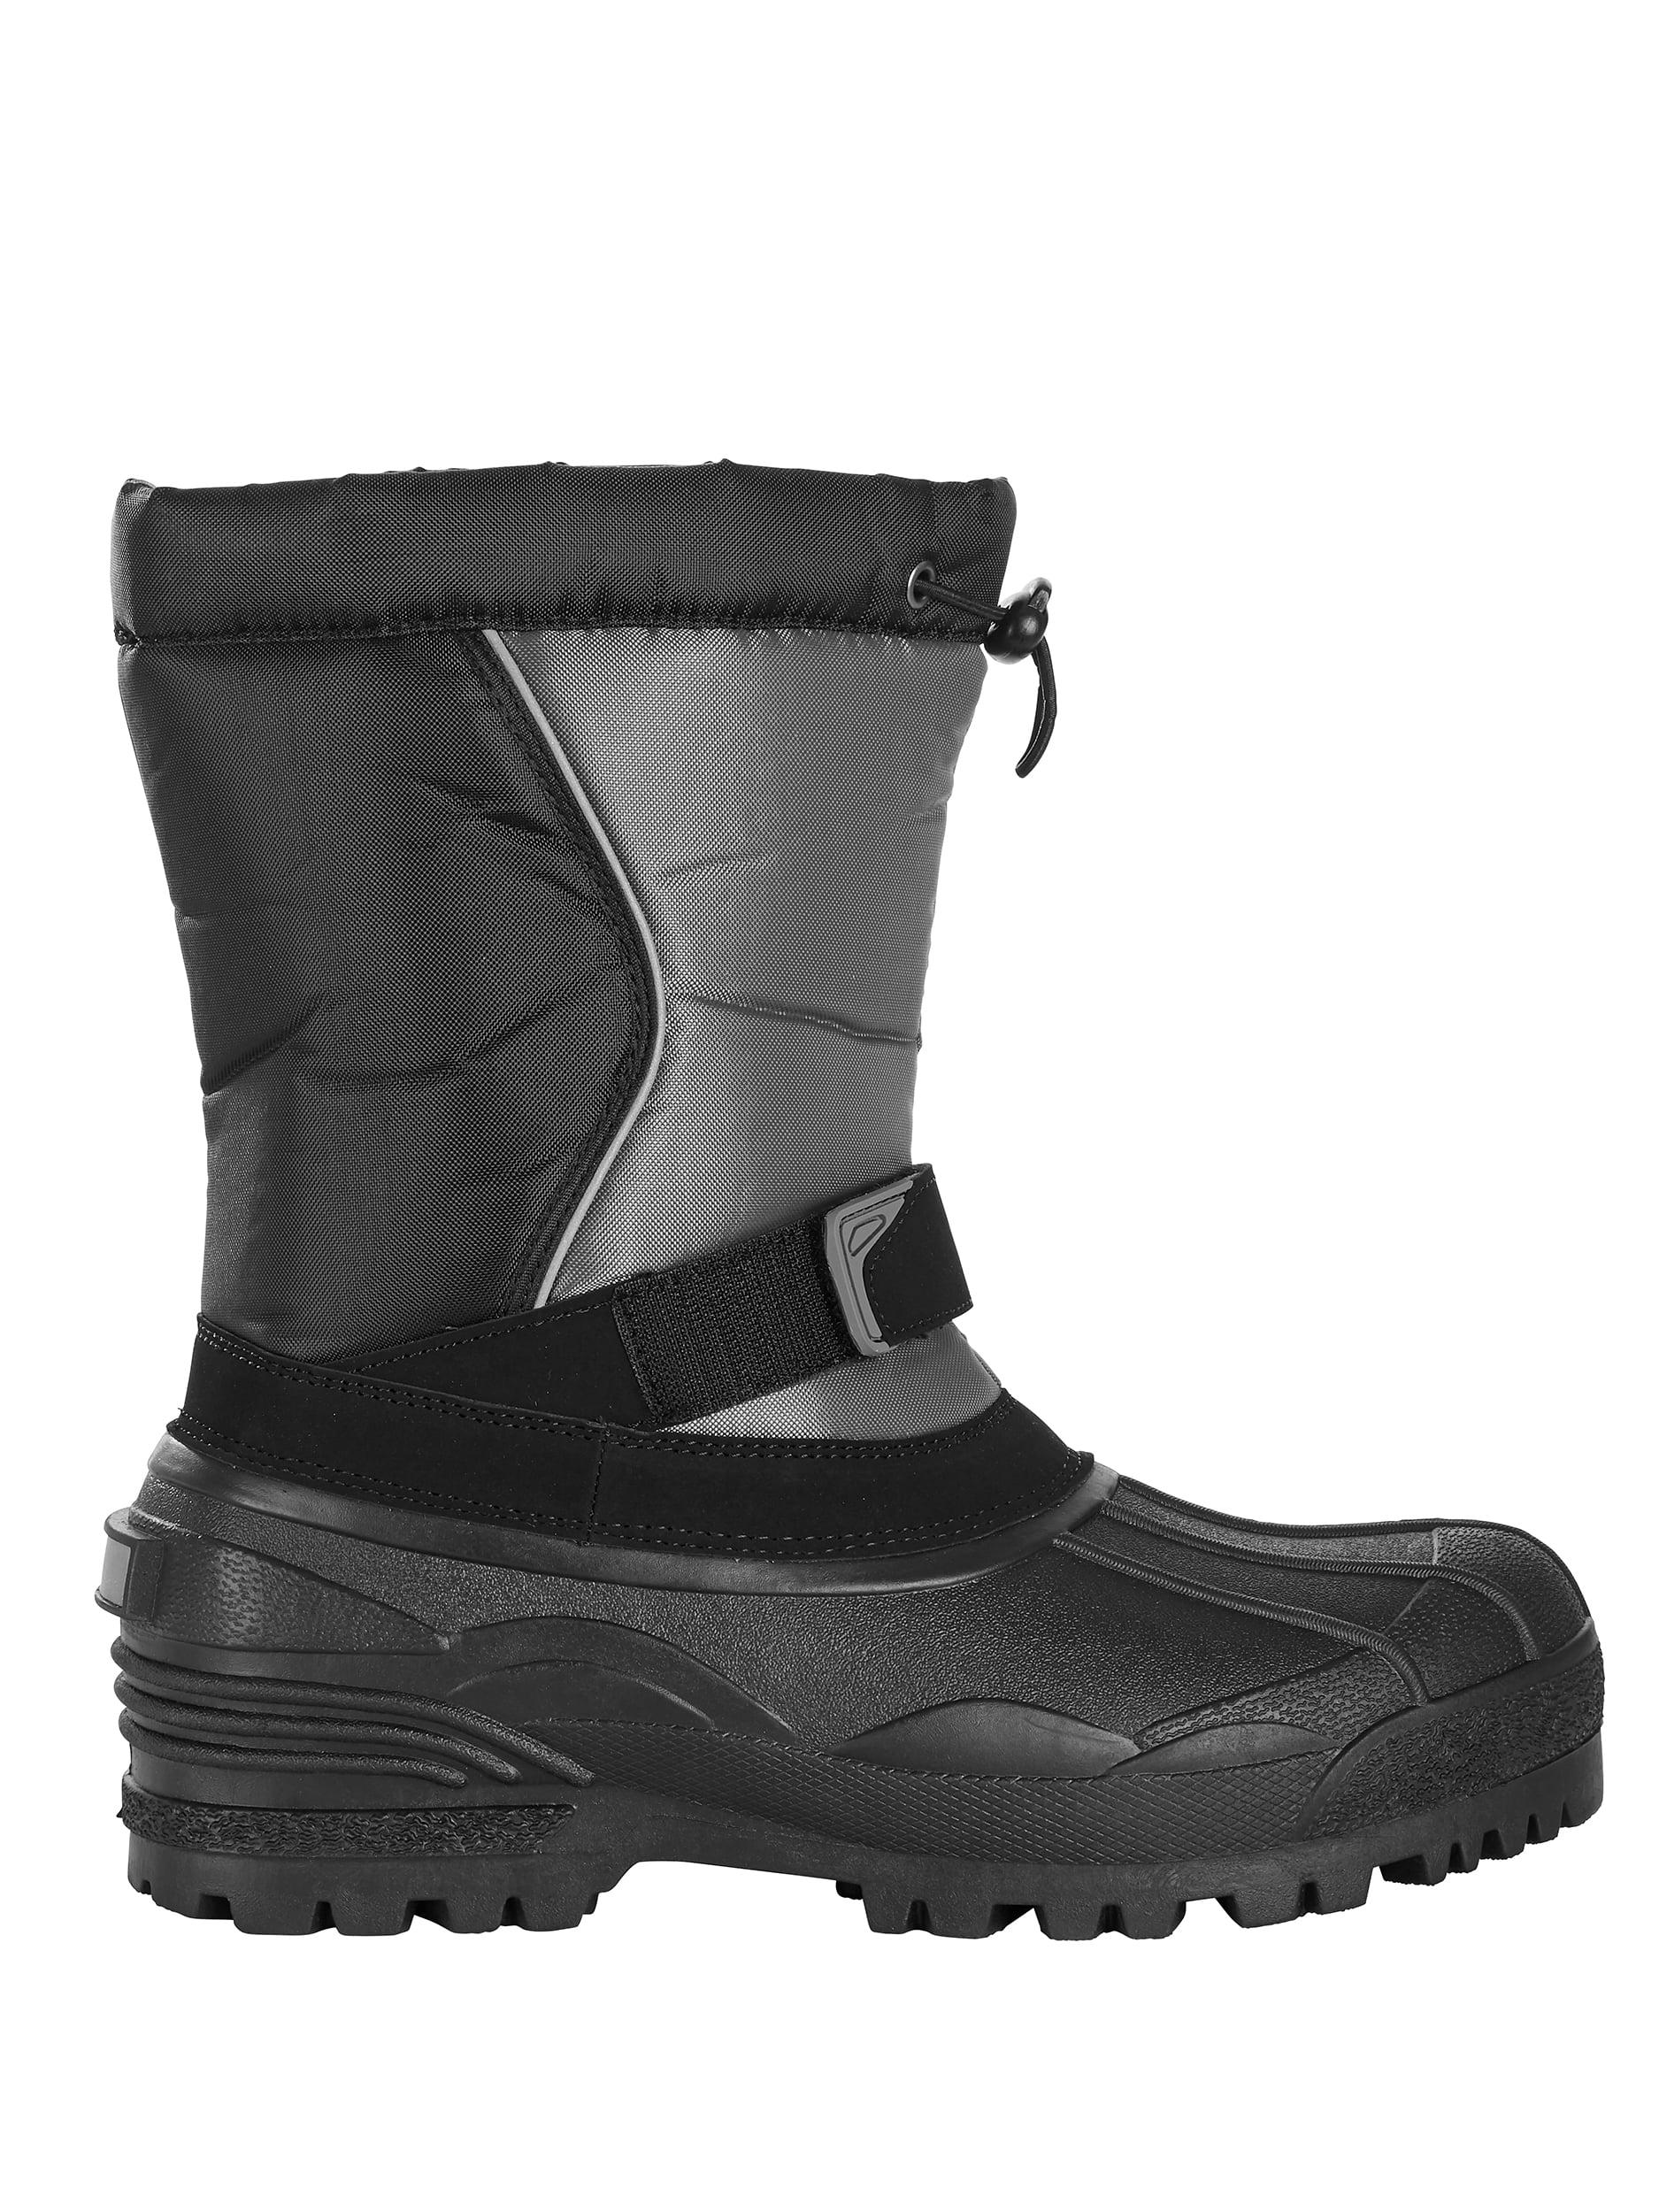 George Men's Essential Winter Boots